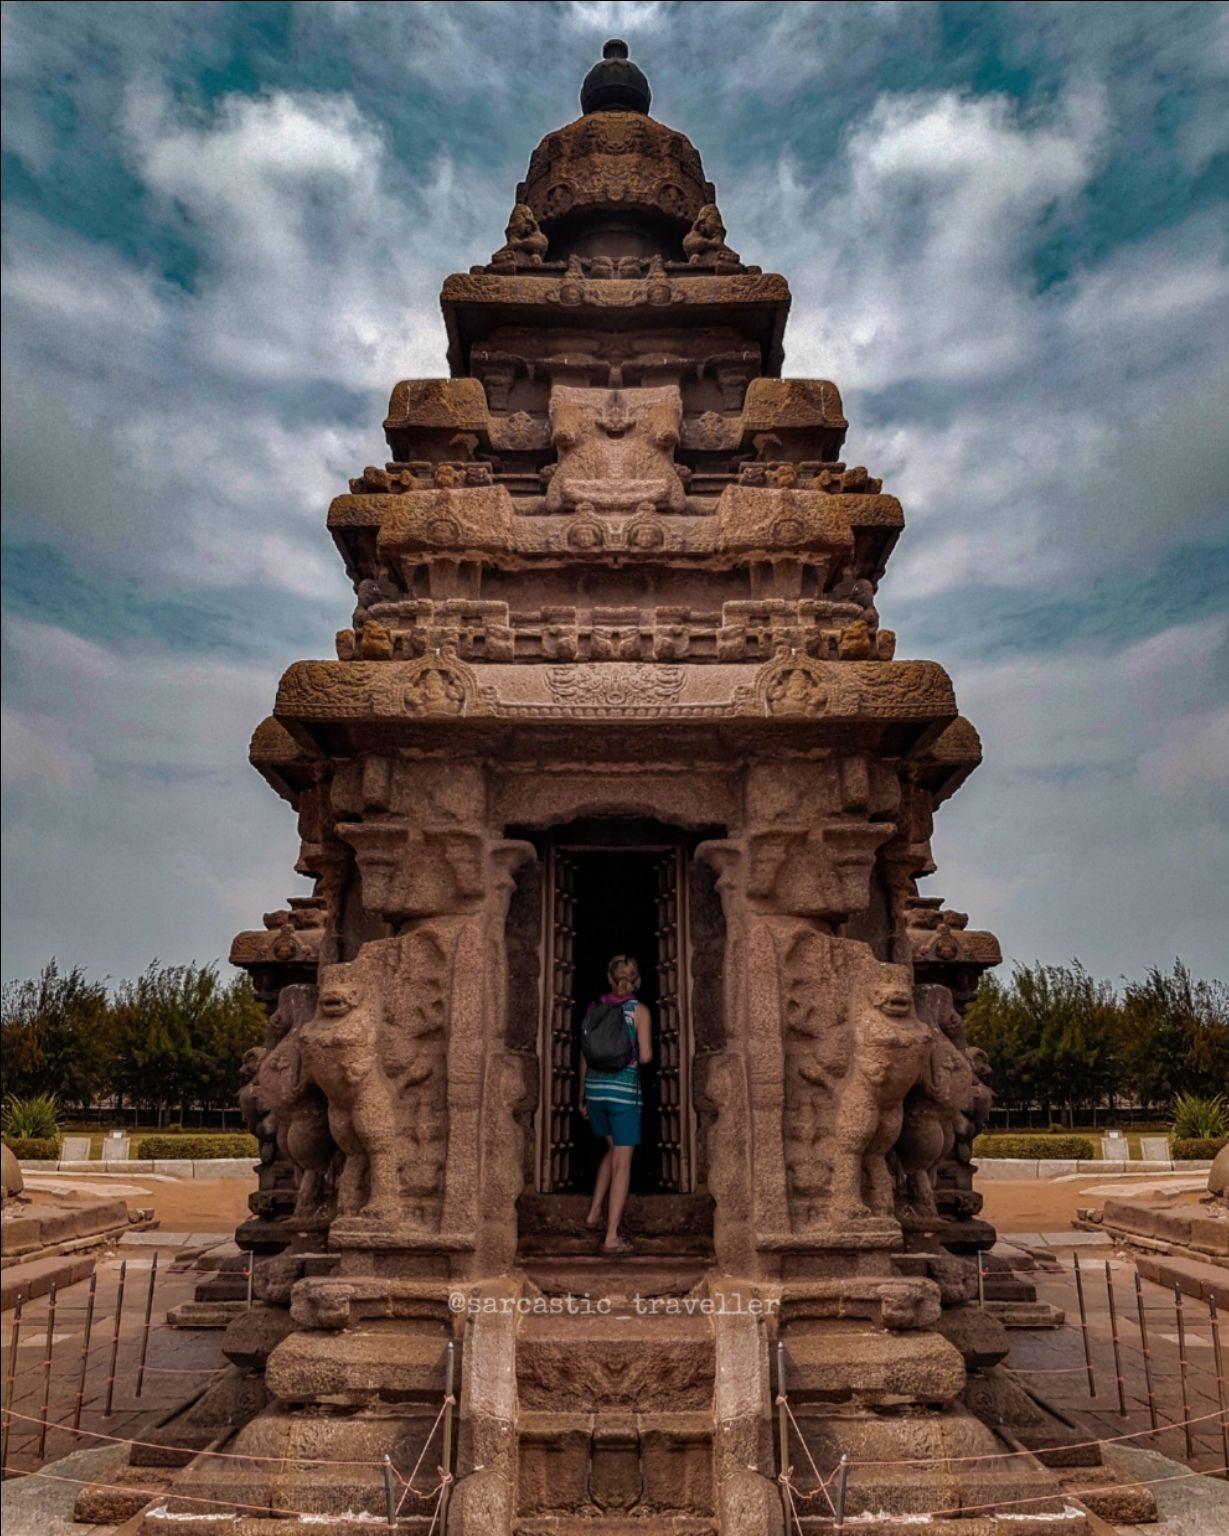 Photo of Mahabalipuram By Sarcastic_traveller